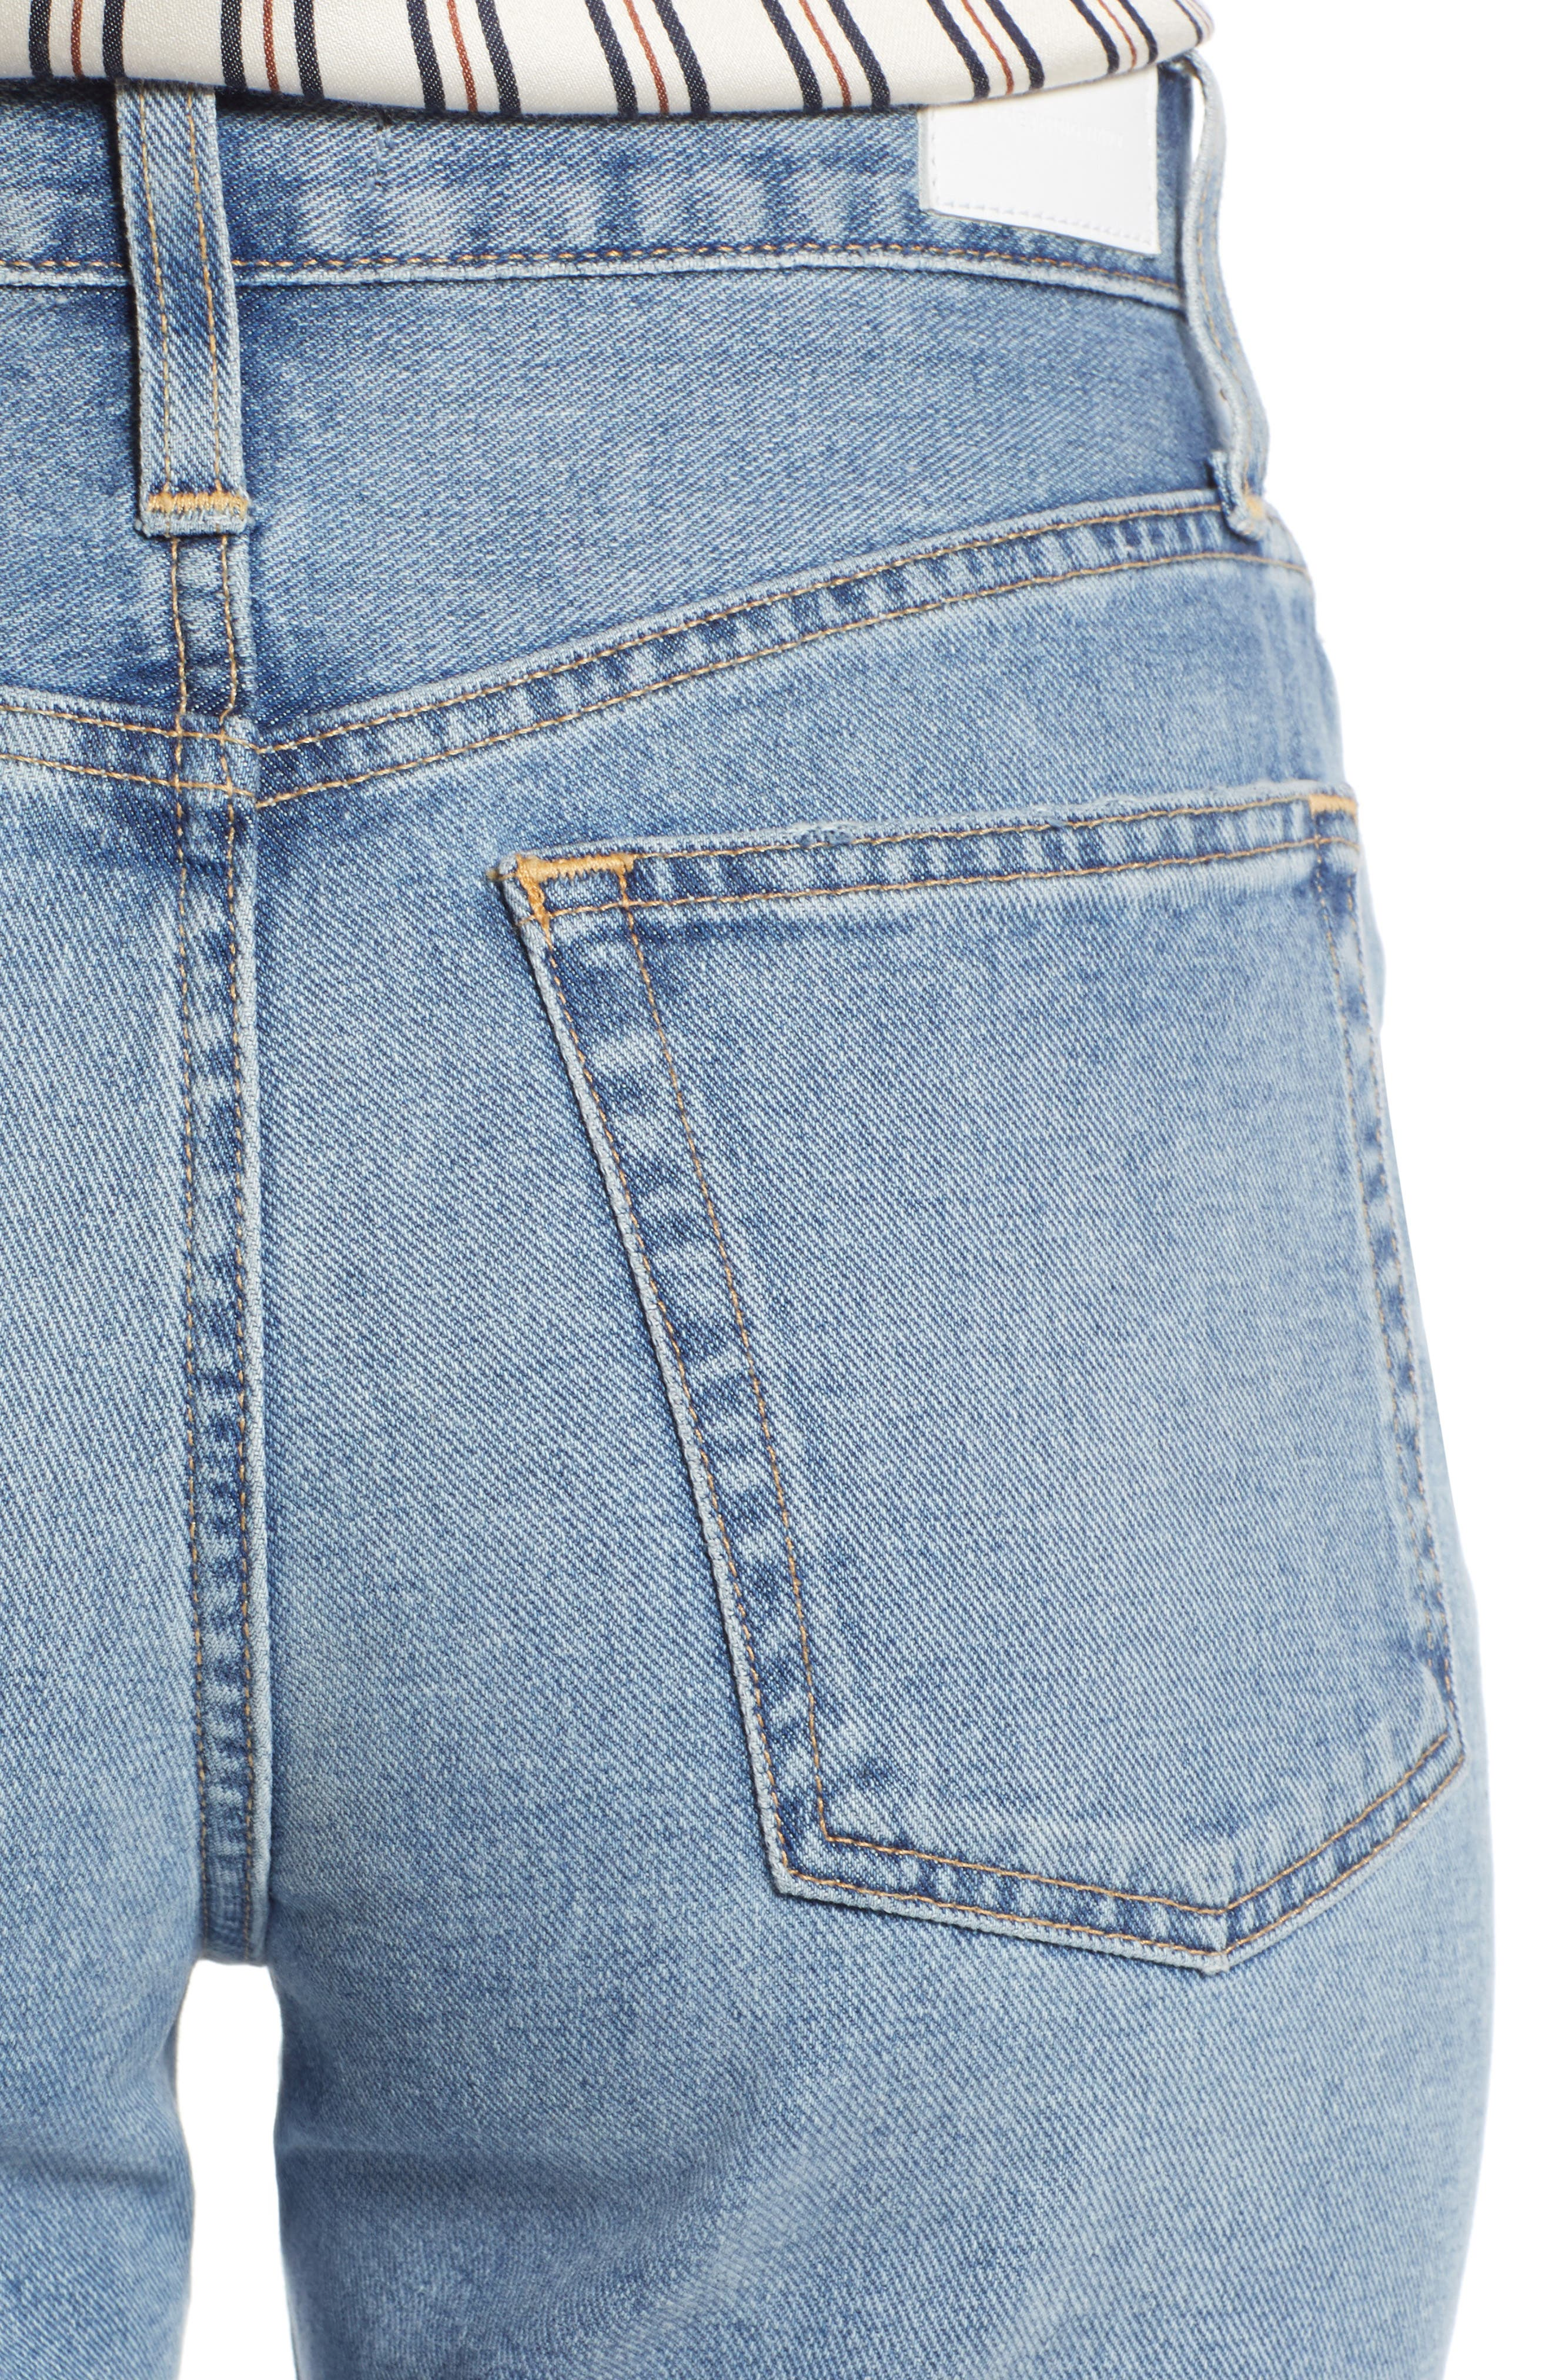 Cigarette Jeans,                             Alternate thumbnail 4, color,                             LIGHT INDIGO WASH